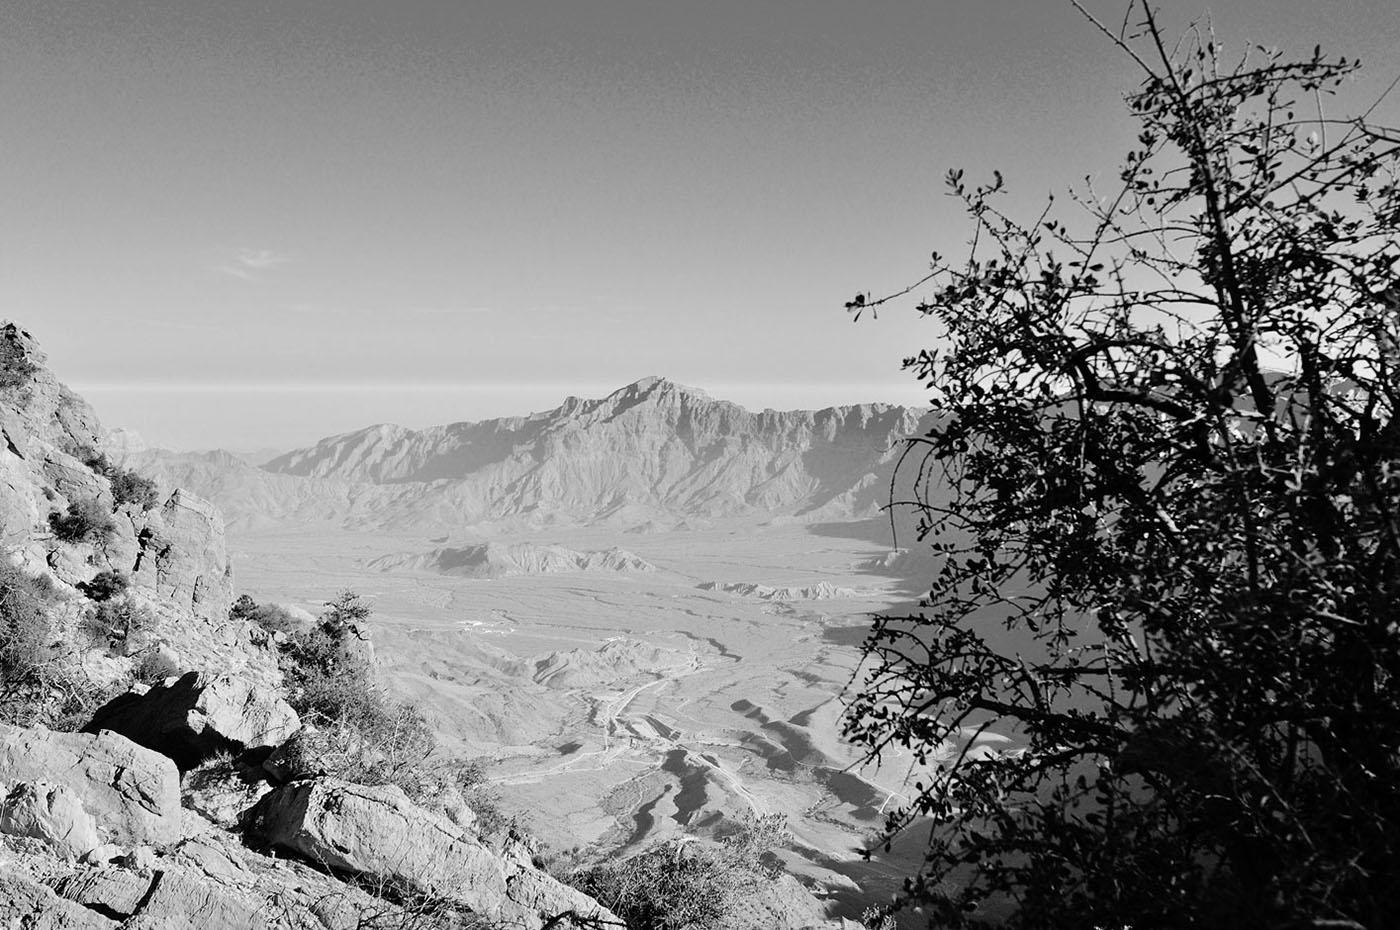 Фотография 7. Оман. Горные пейзажи. Пример фото на Nikon D300s + ширик Nikon 14-24mm f/2.8G. Настройки: 200, F7,1; 1/800 s., экспокоррекция: +0,2.